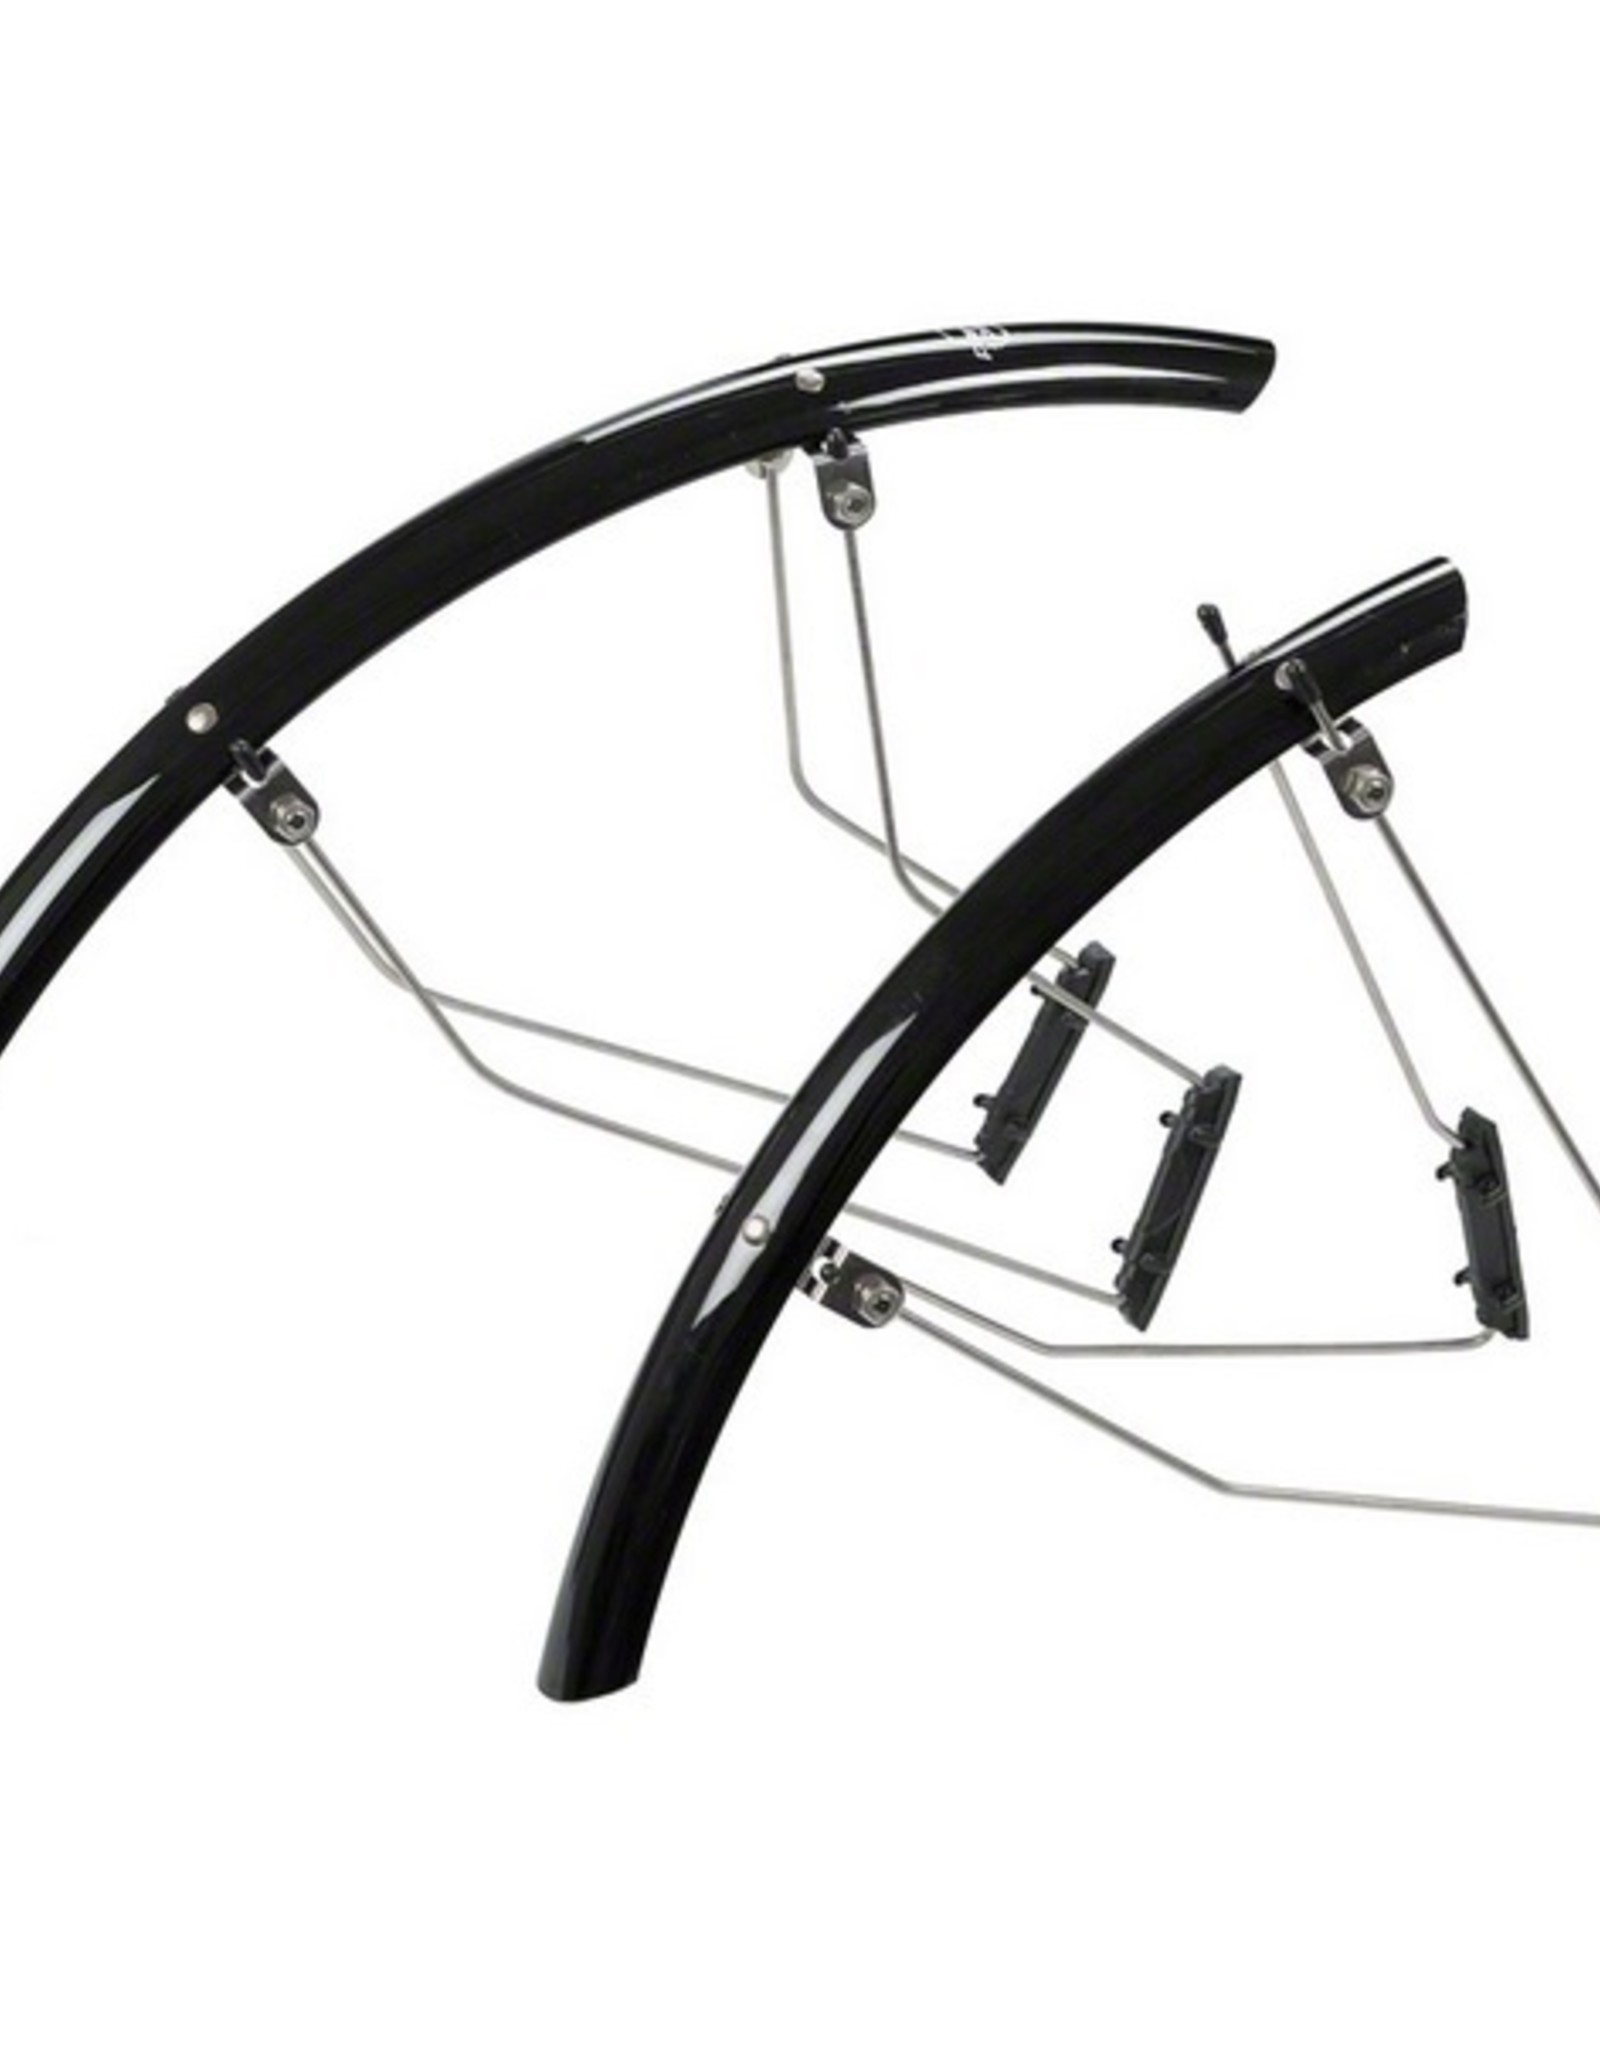 Planet Bike Planet Bike Speedez Fenders - 700x35